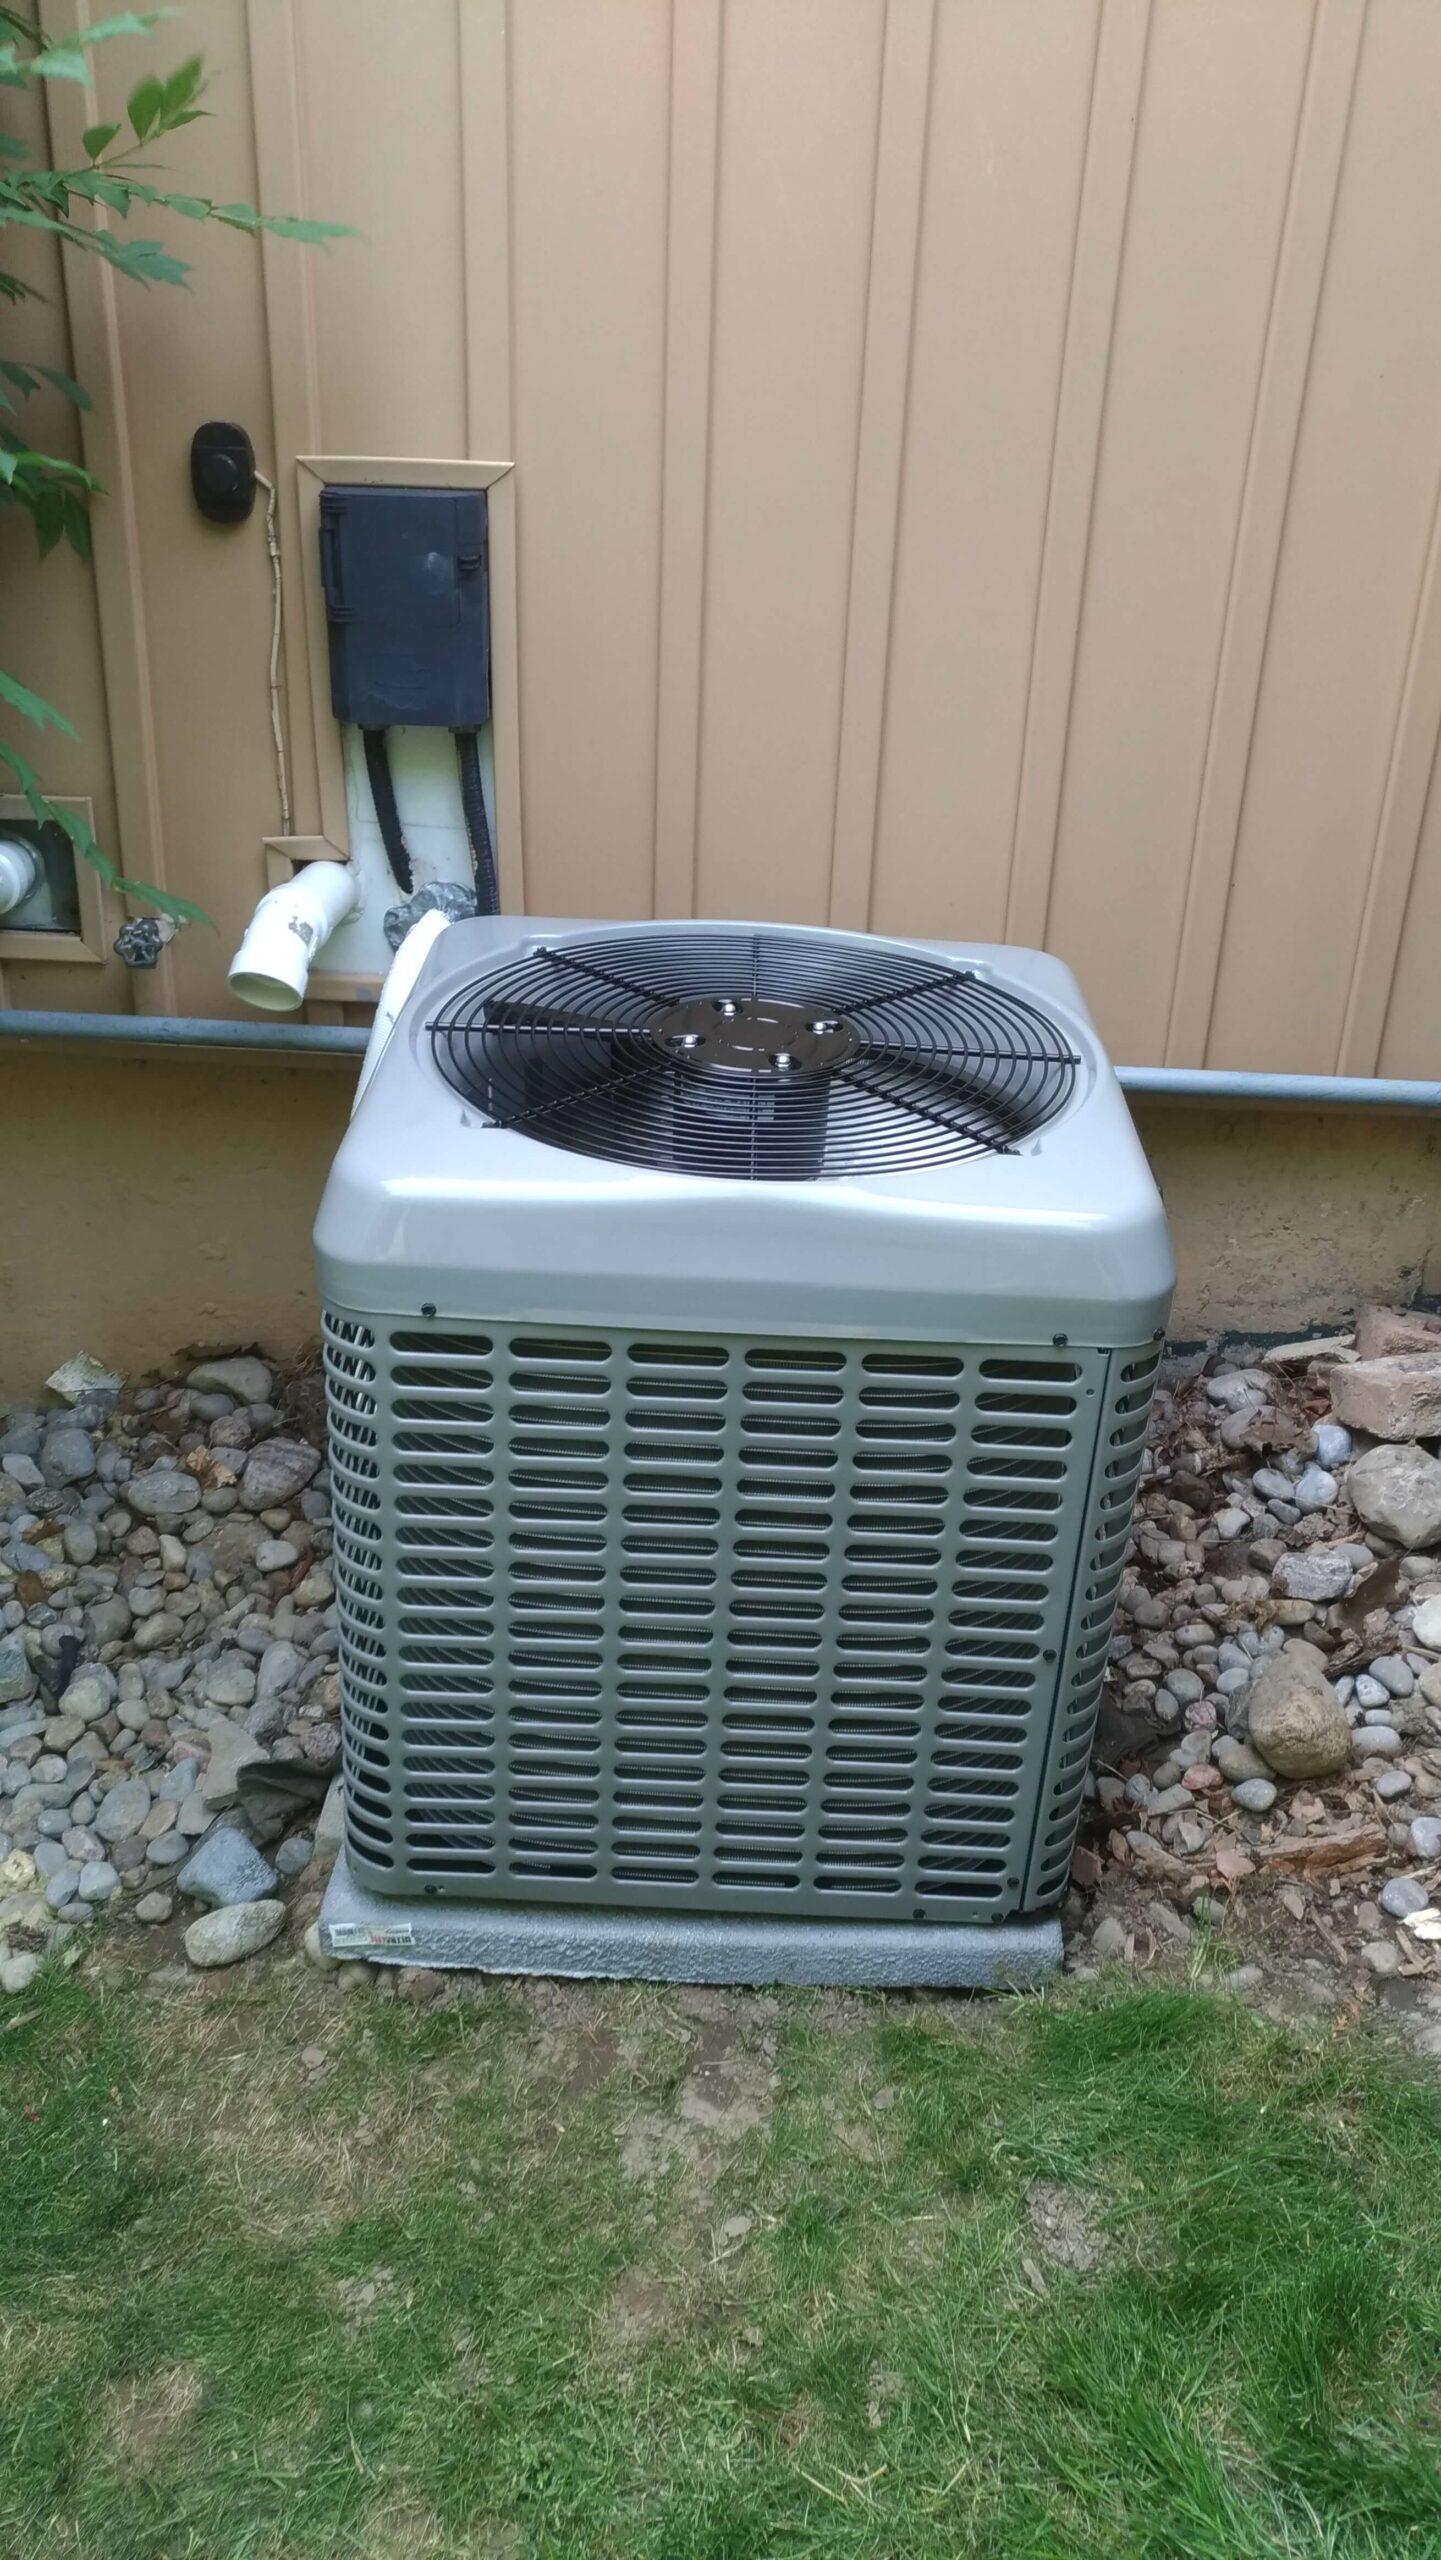 air conditioner install toronto, air conditioning toronto, buy a new air conditioner toronto, ac install toronto, maintenance and rental